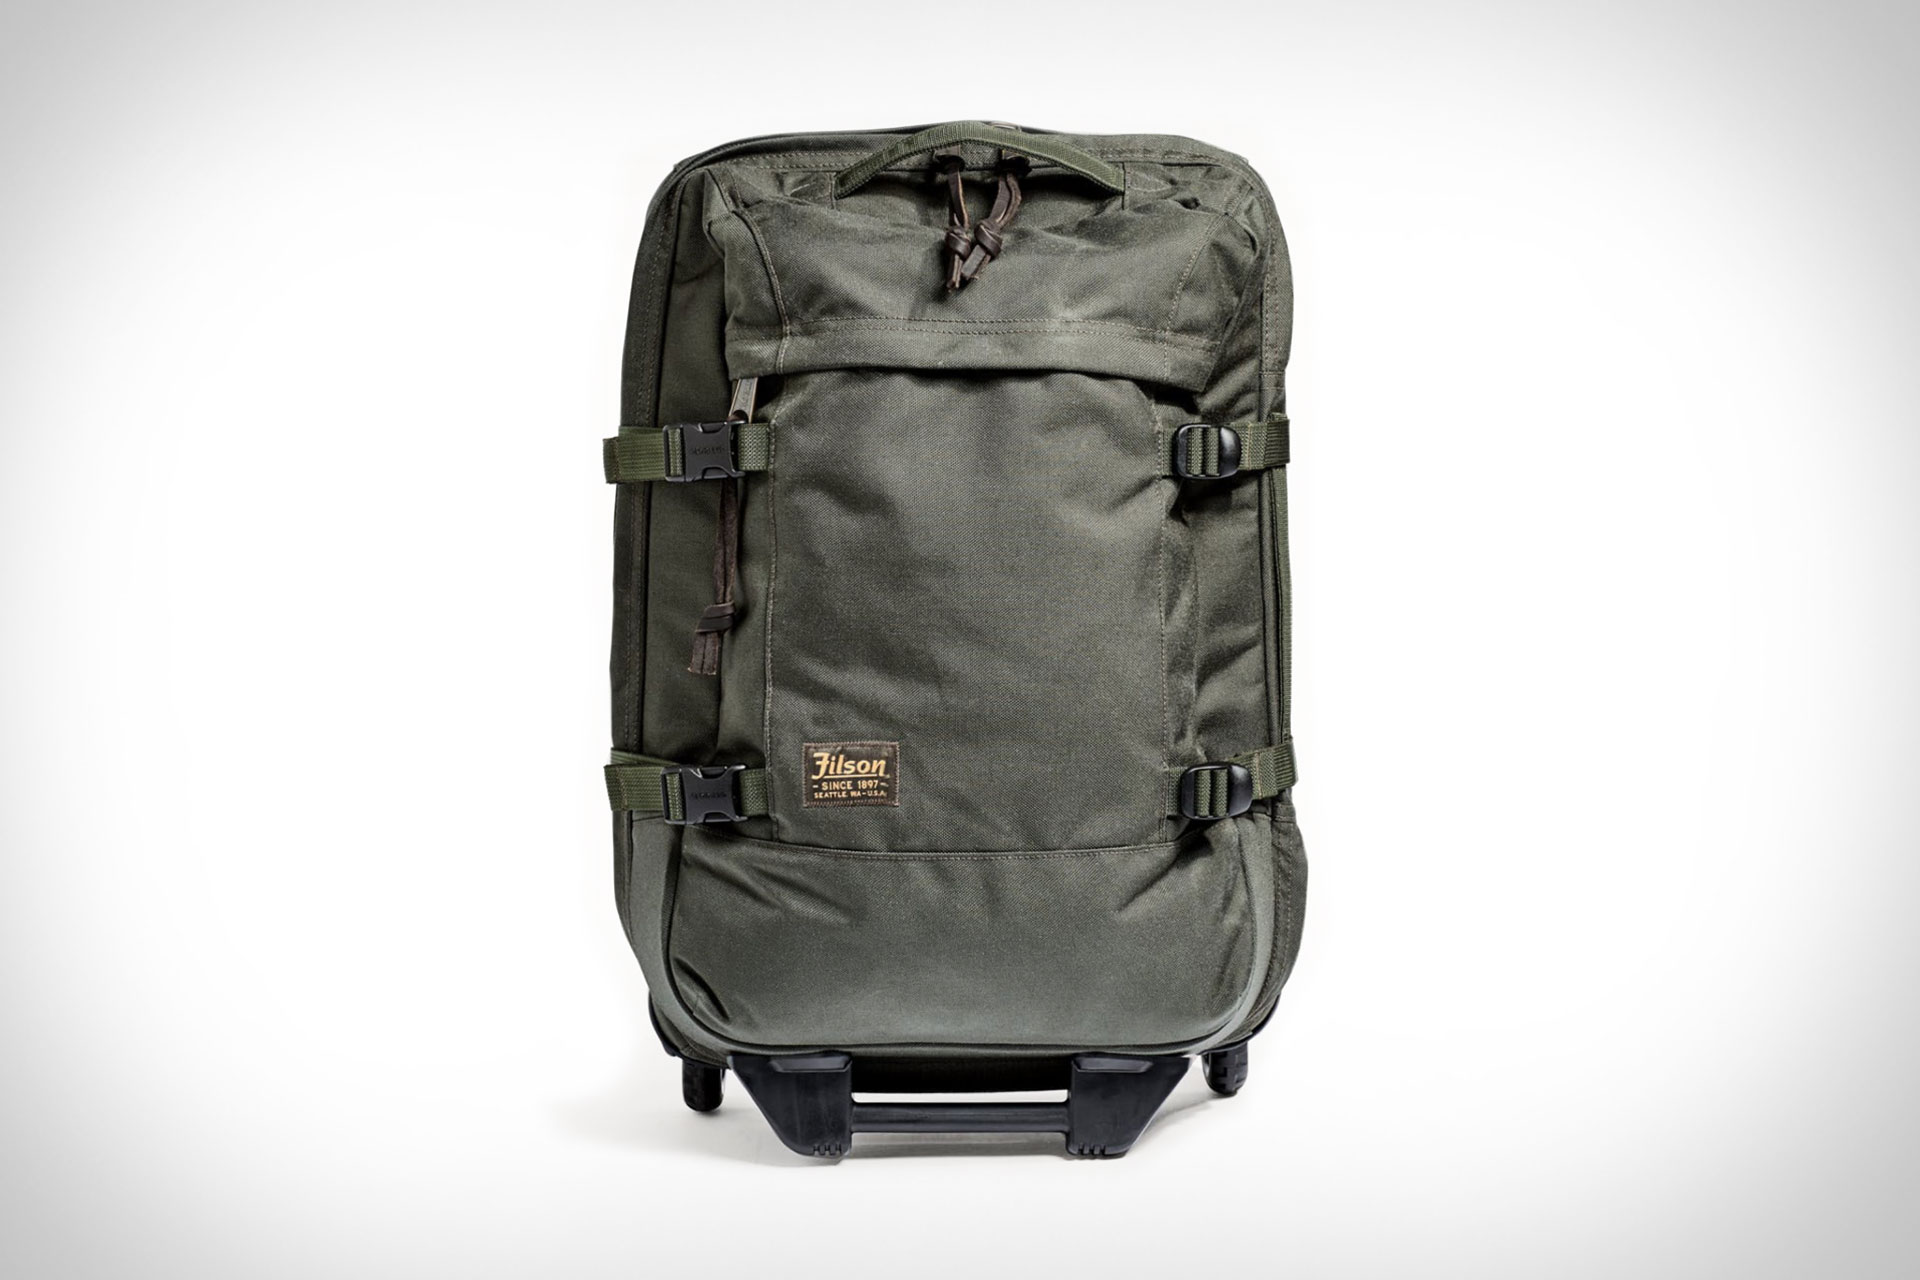 Filson Dryden Carry-On Bag